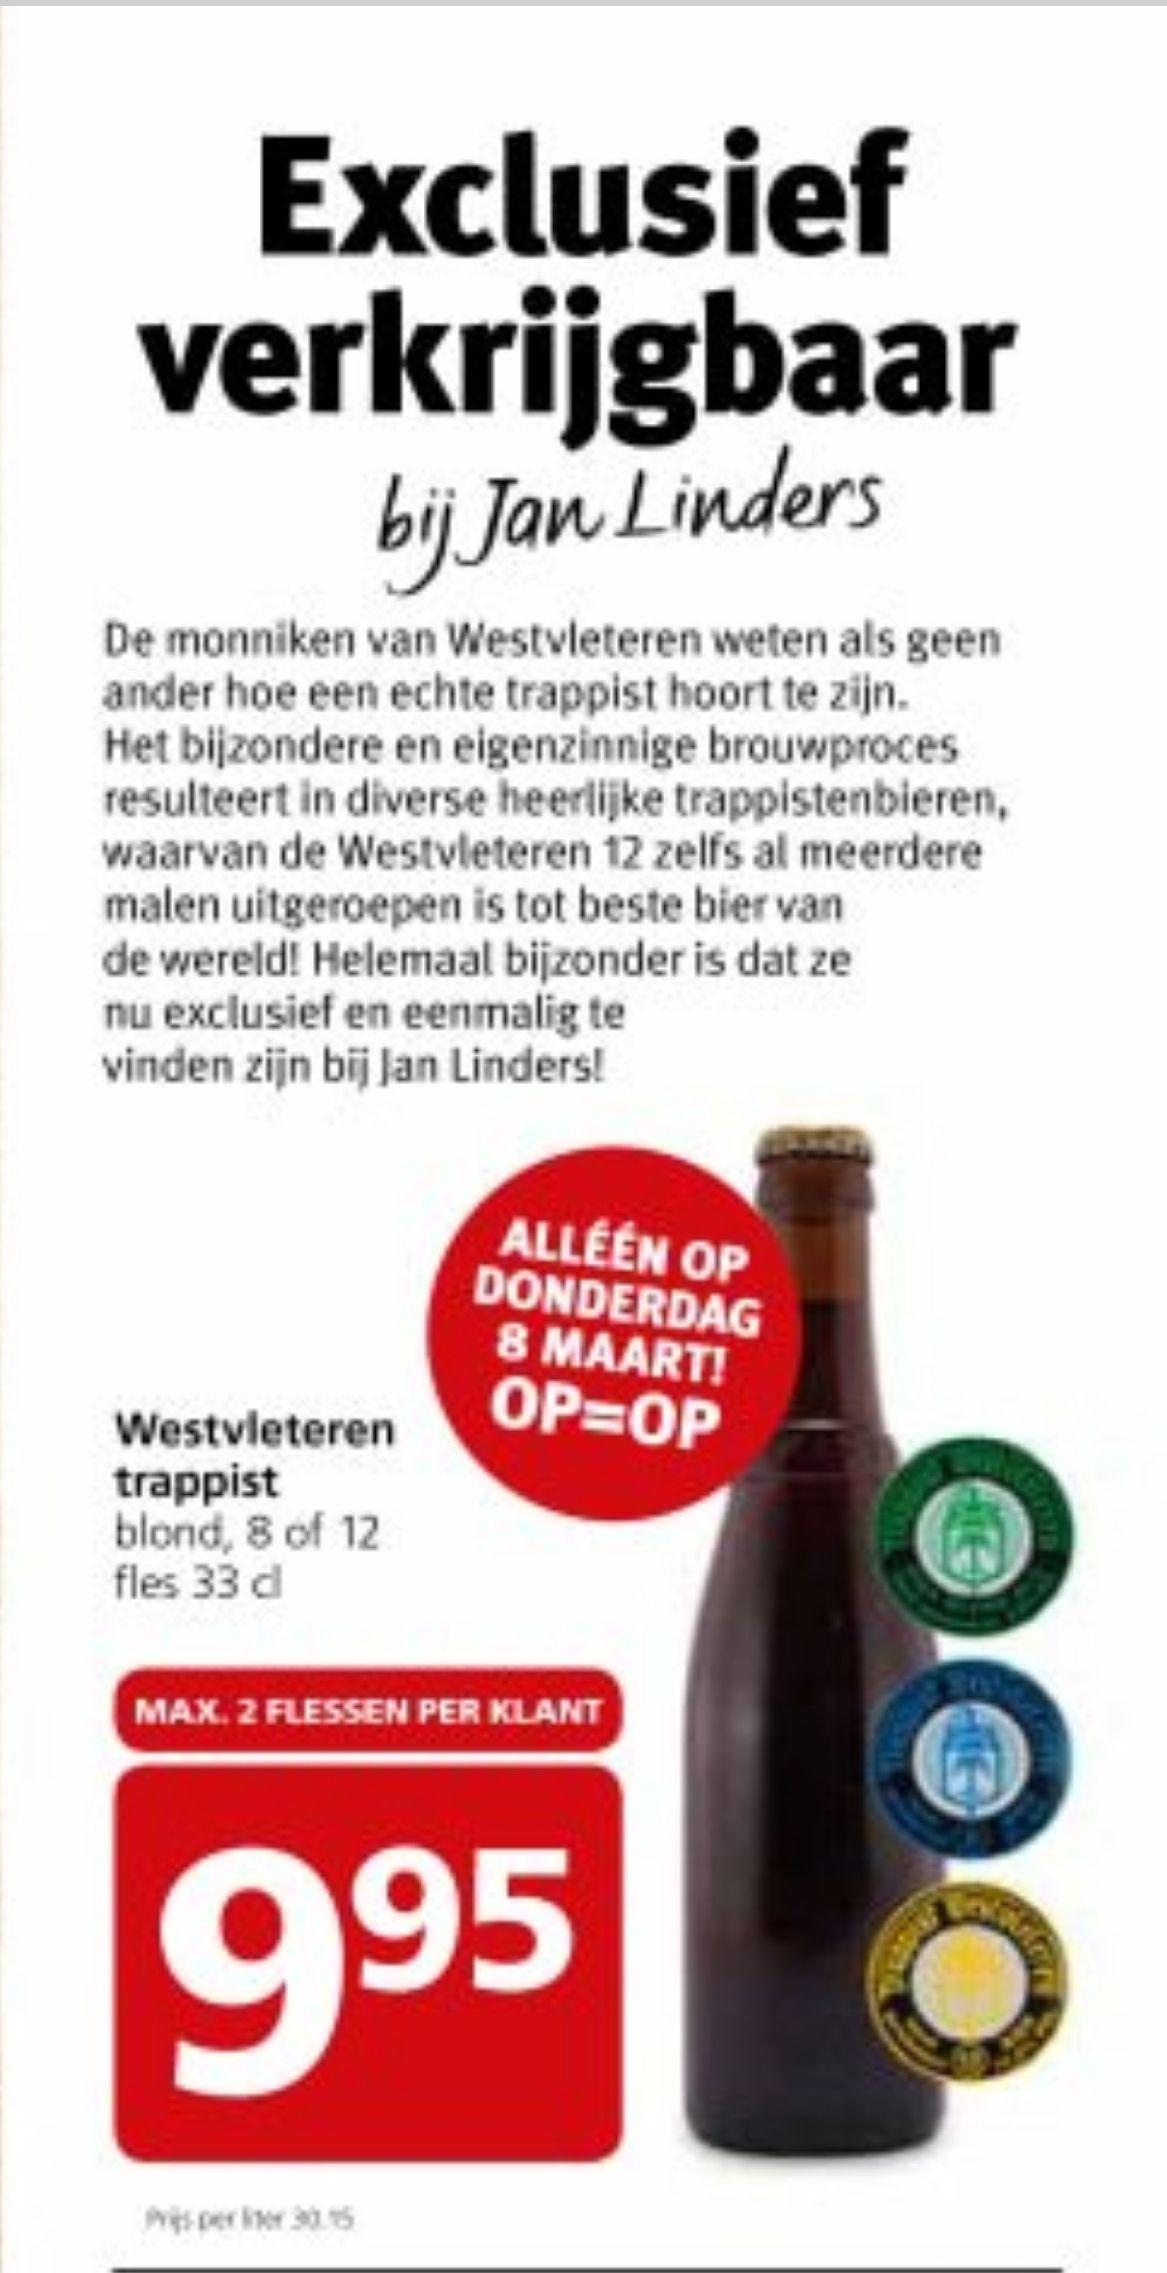 Westvleteren trappist bier @Jan Linders